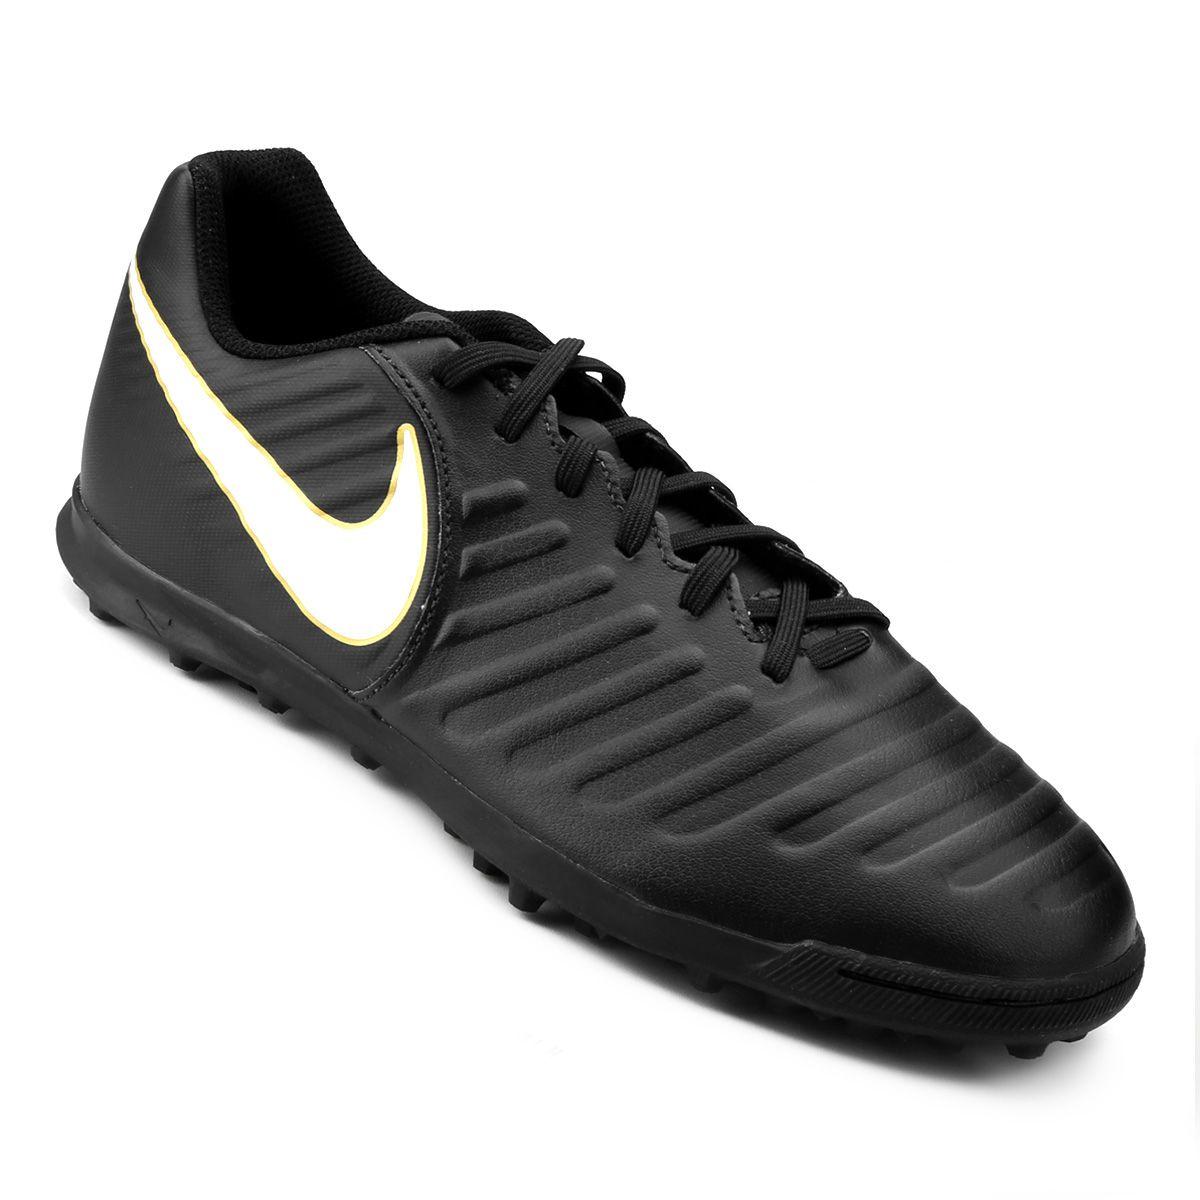 bb469867d2 Chuteira Society Nike Tiempox Rio Iv Tf - BRACIA SHOP  Loja de ...